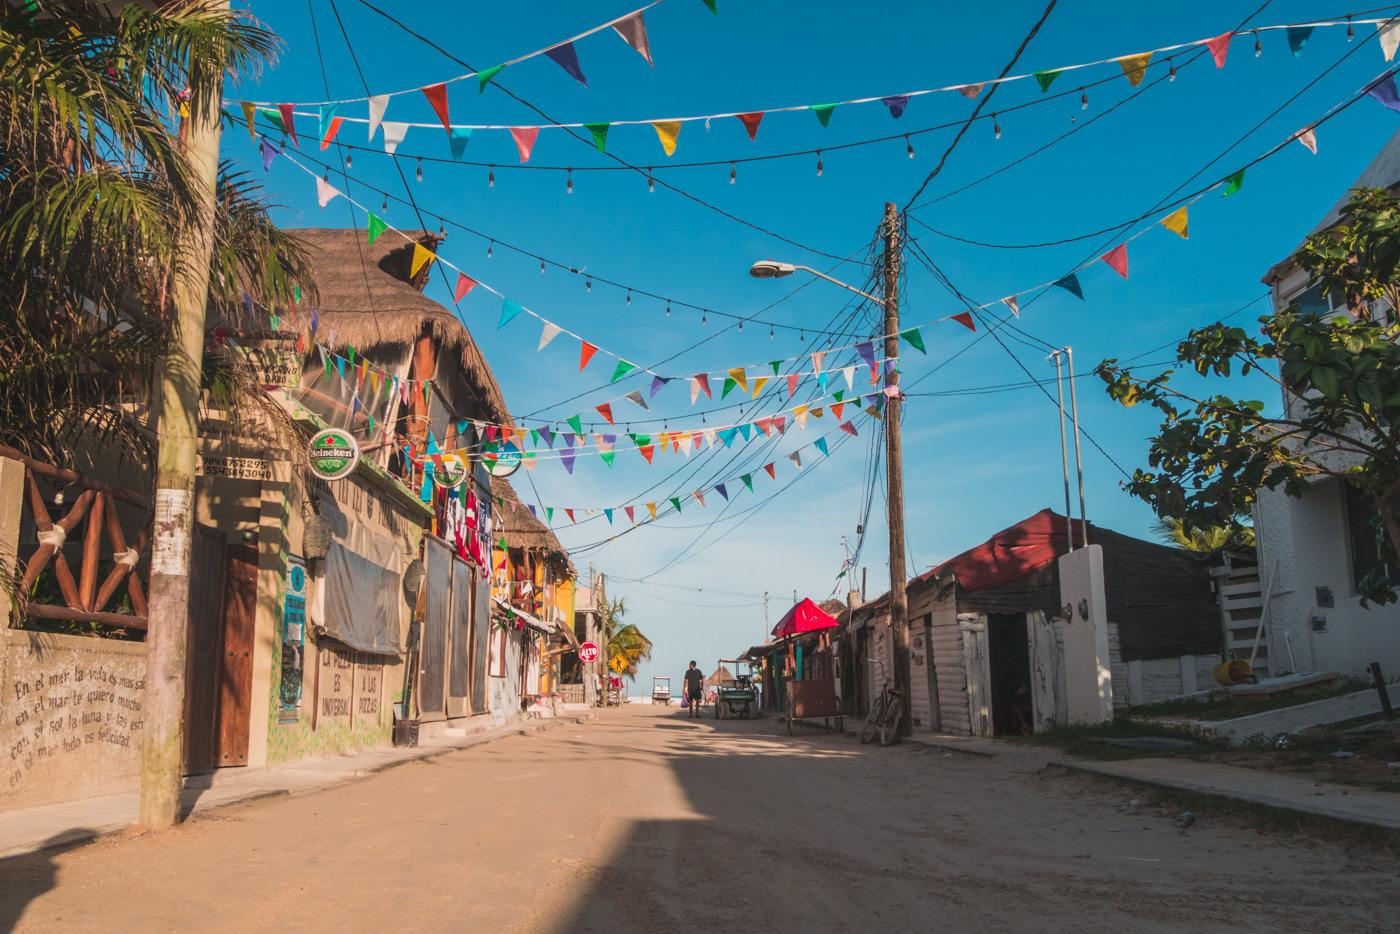 Straße auf Isla Holbox in Mexiko